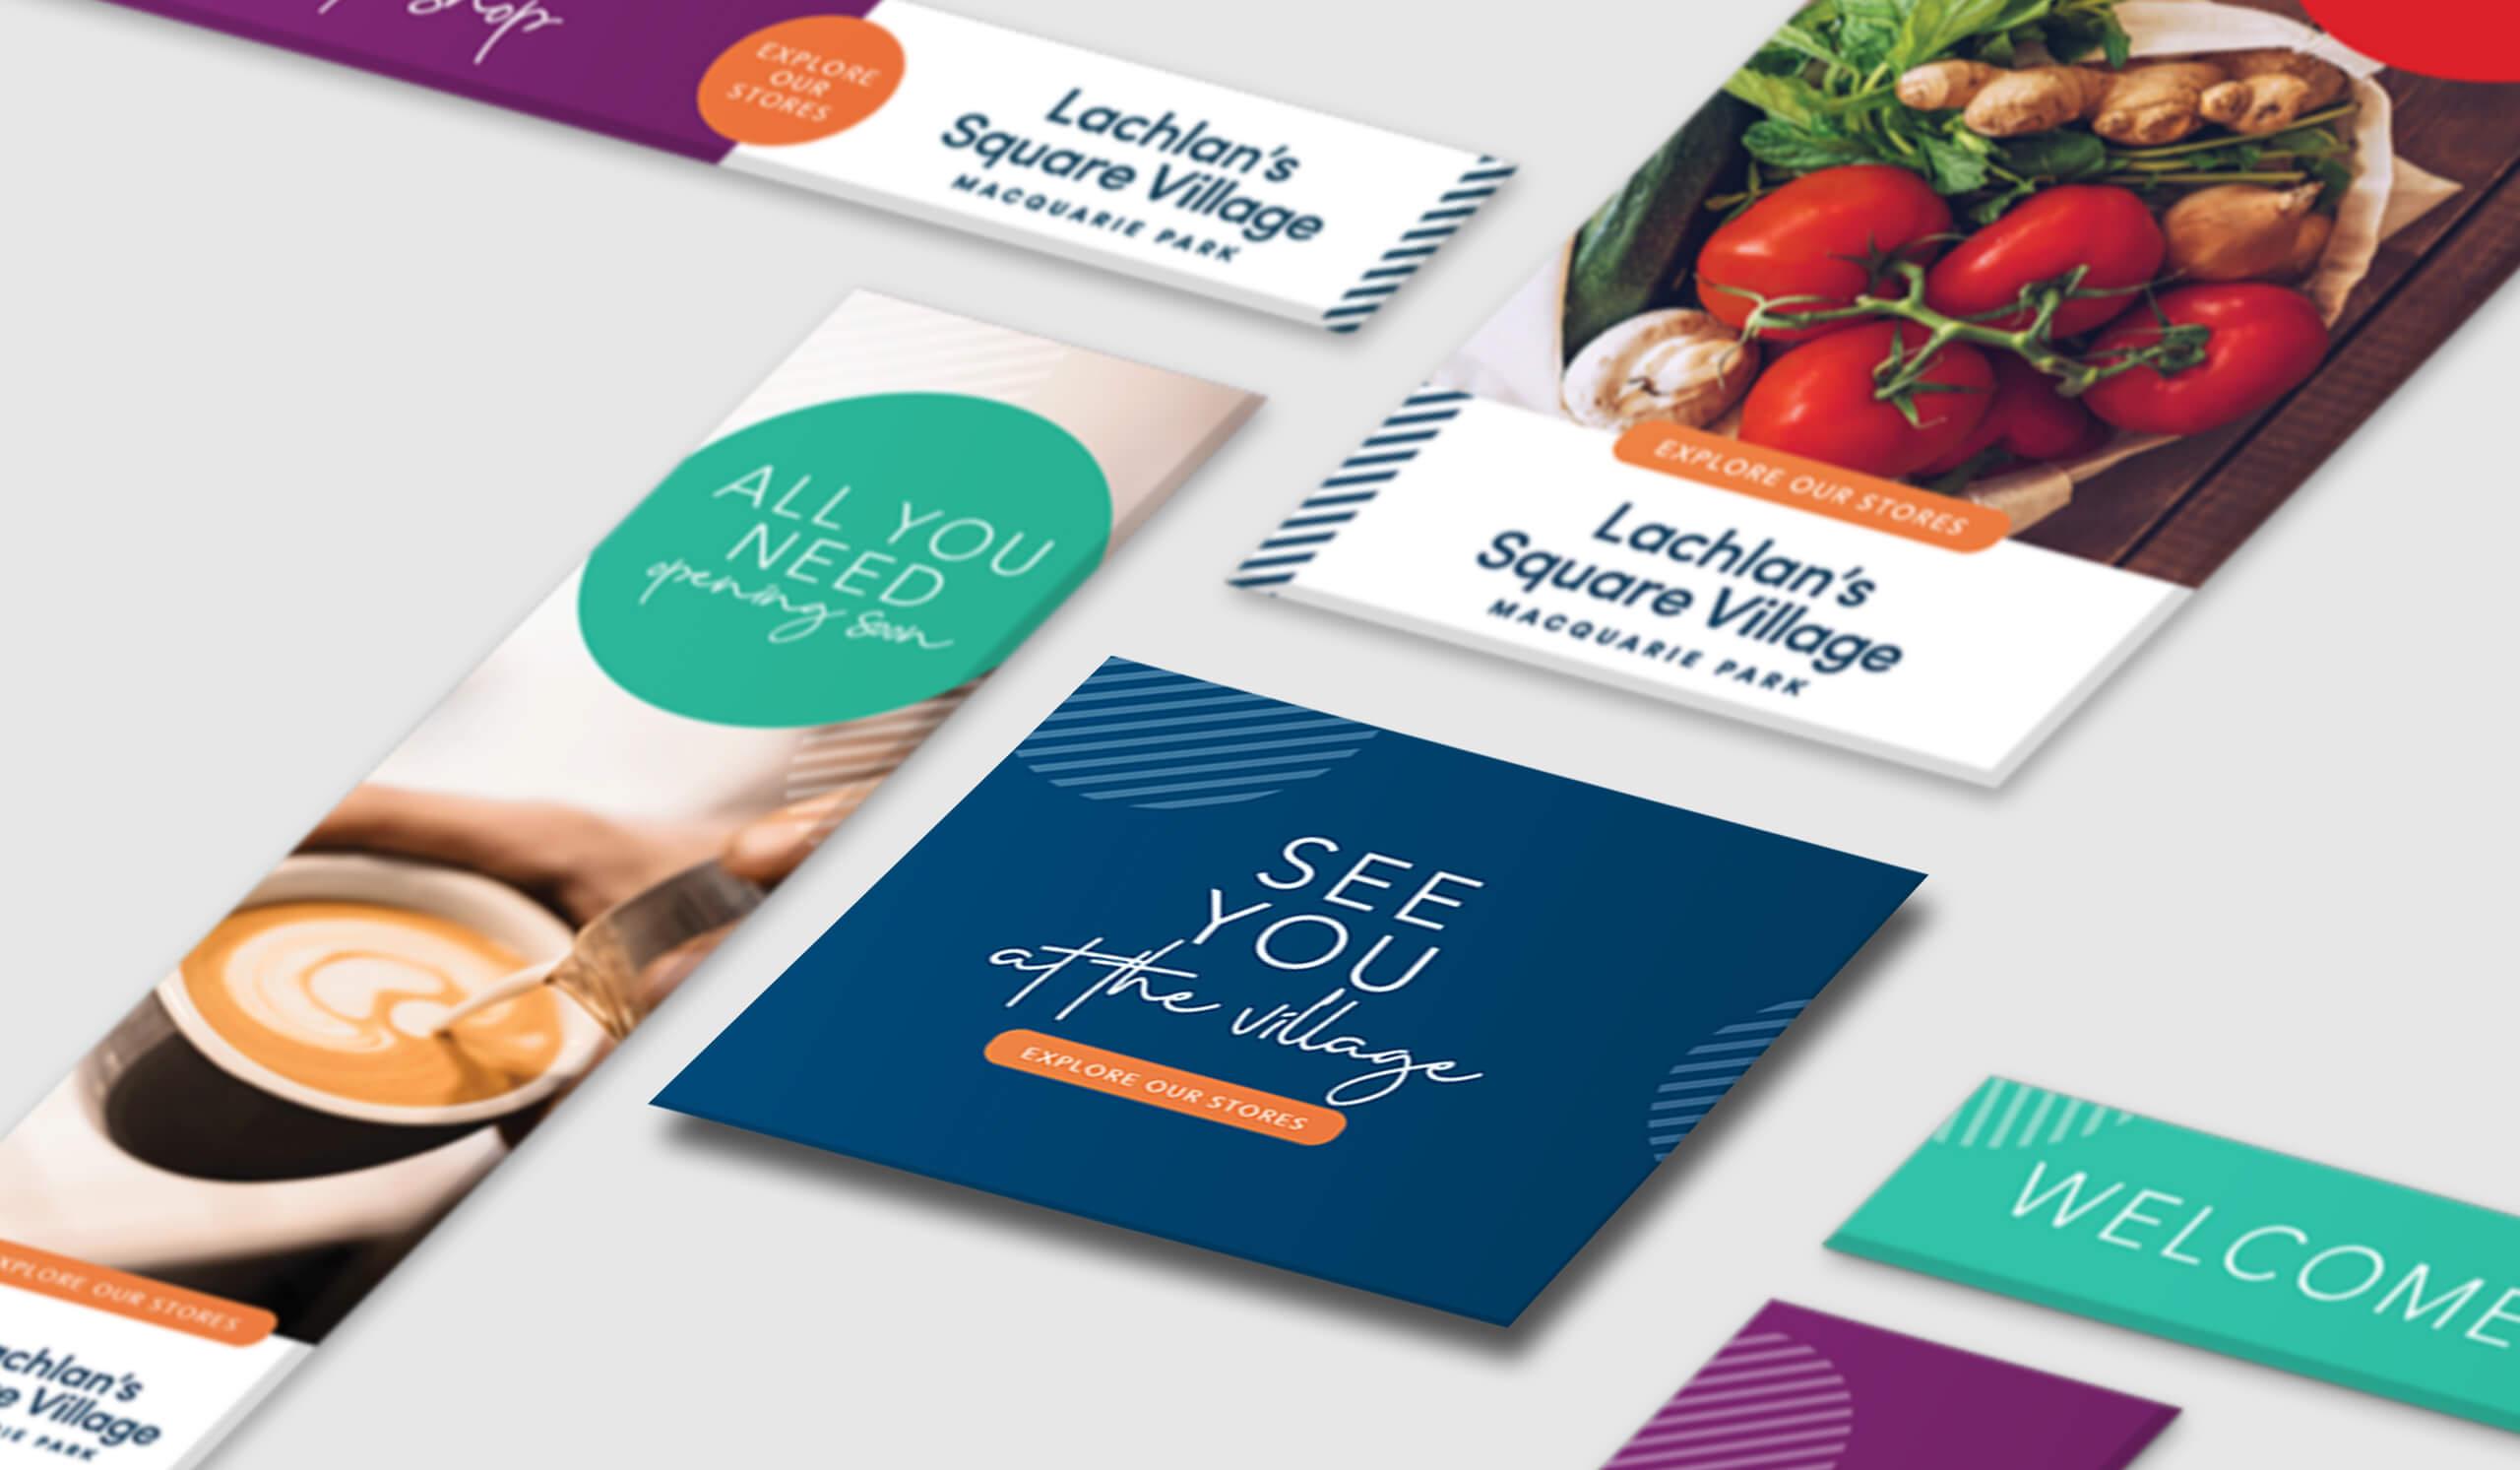 design-and-marketing-lachlans-square-village-programmatic-ads